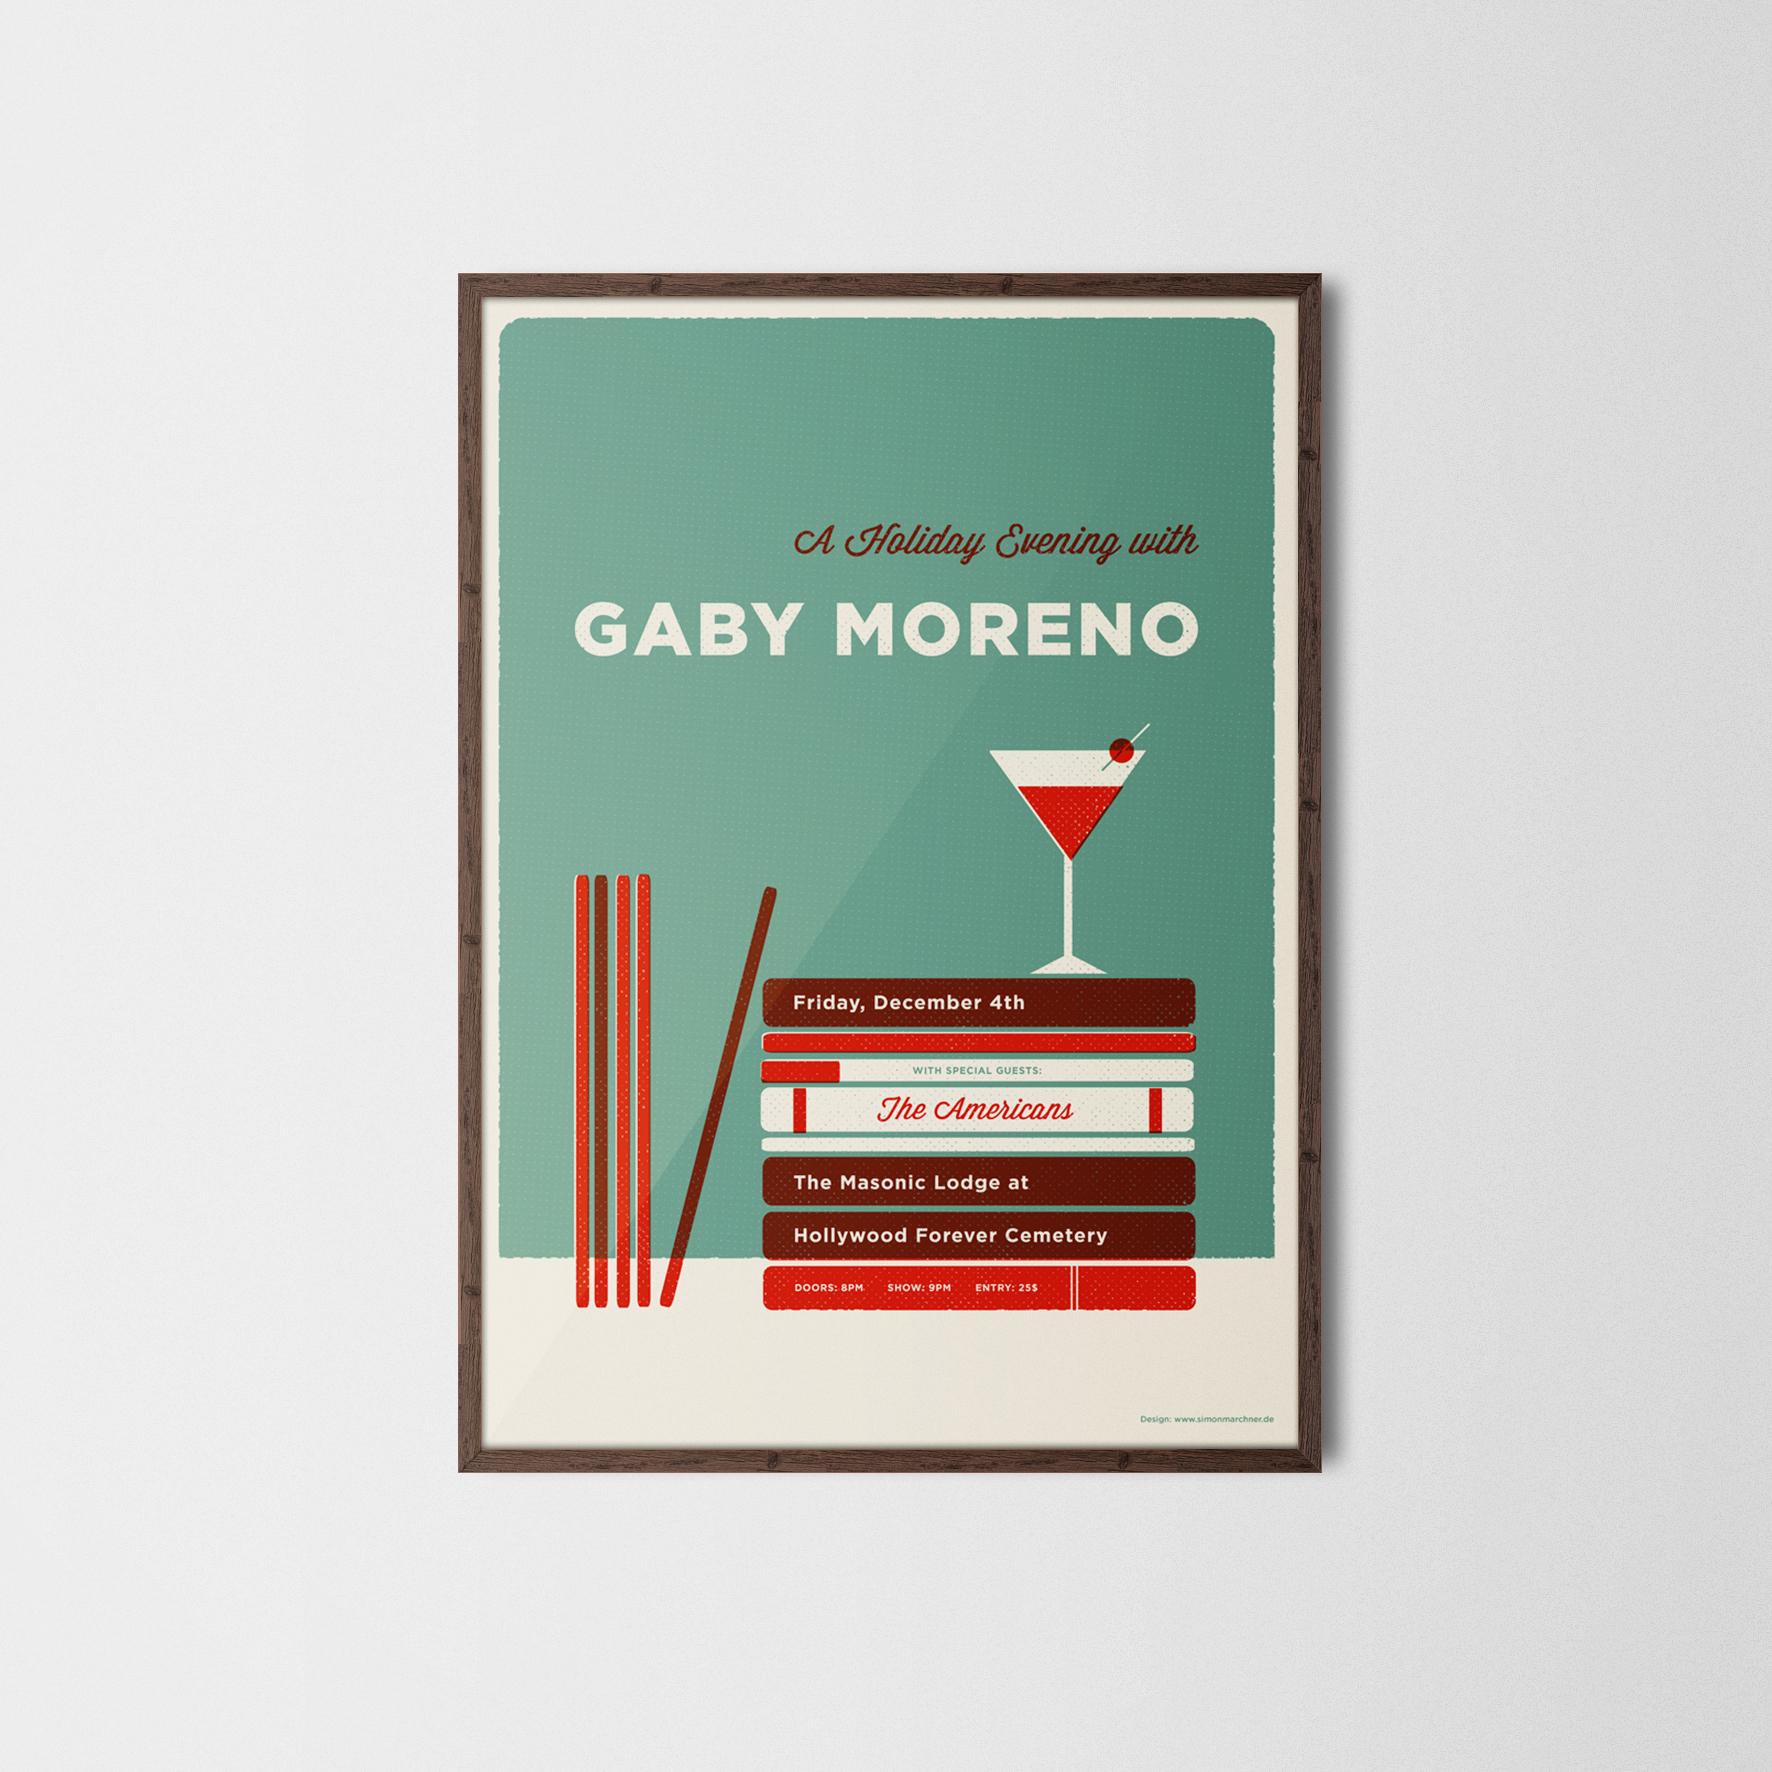 gabymoreno_frame2